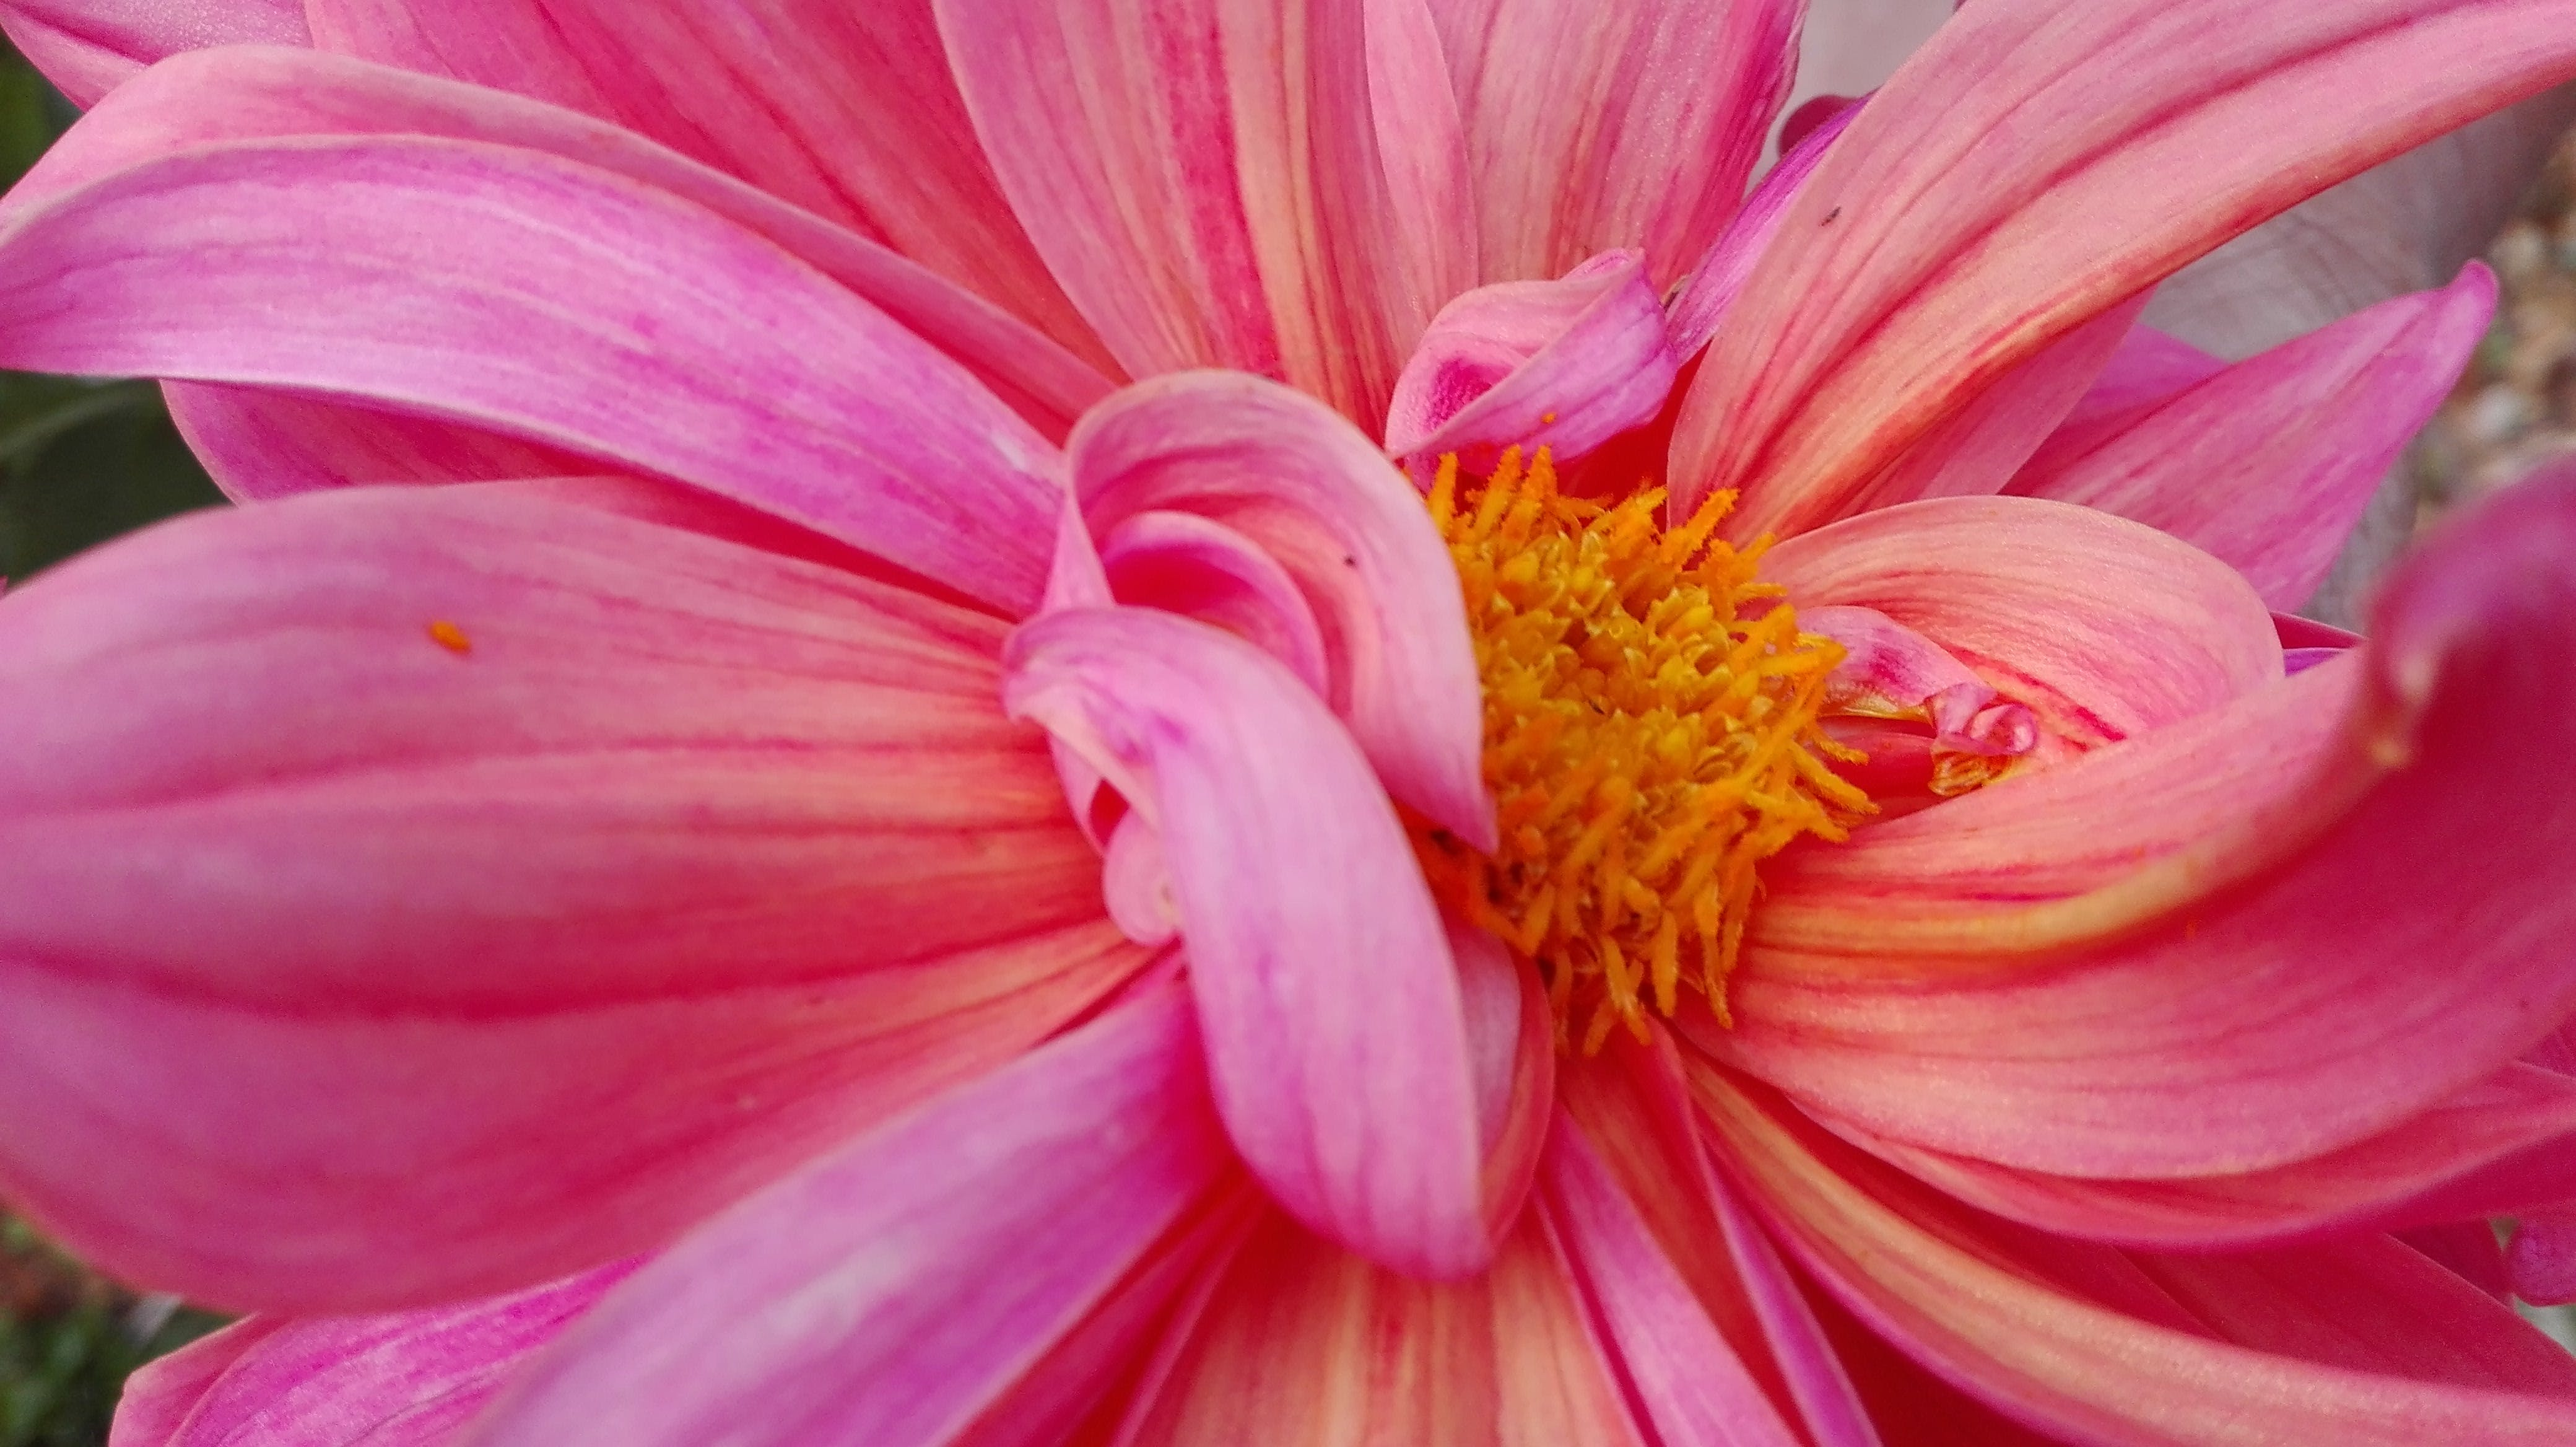 Macro Photography of Pink Dahlia Flower